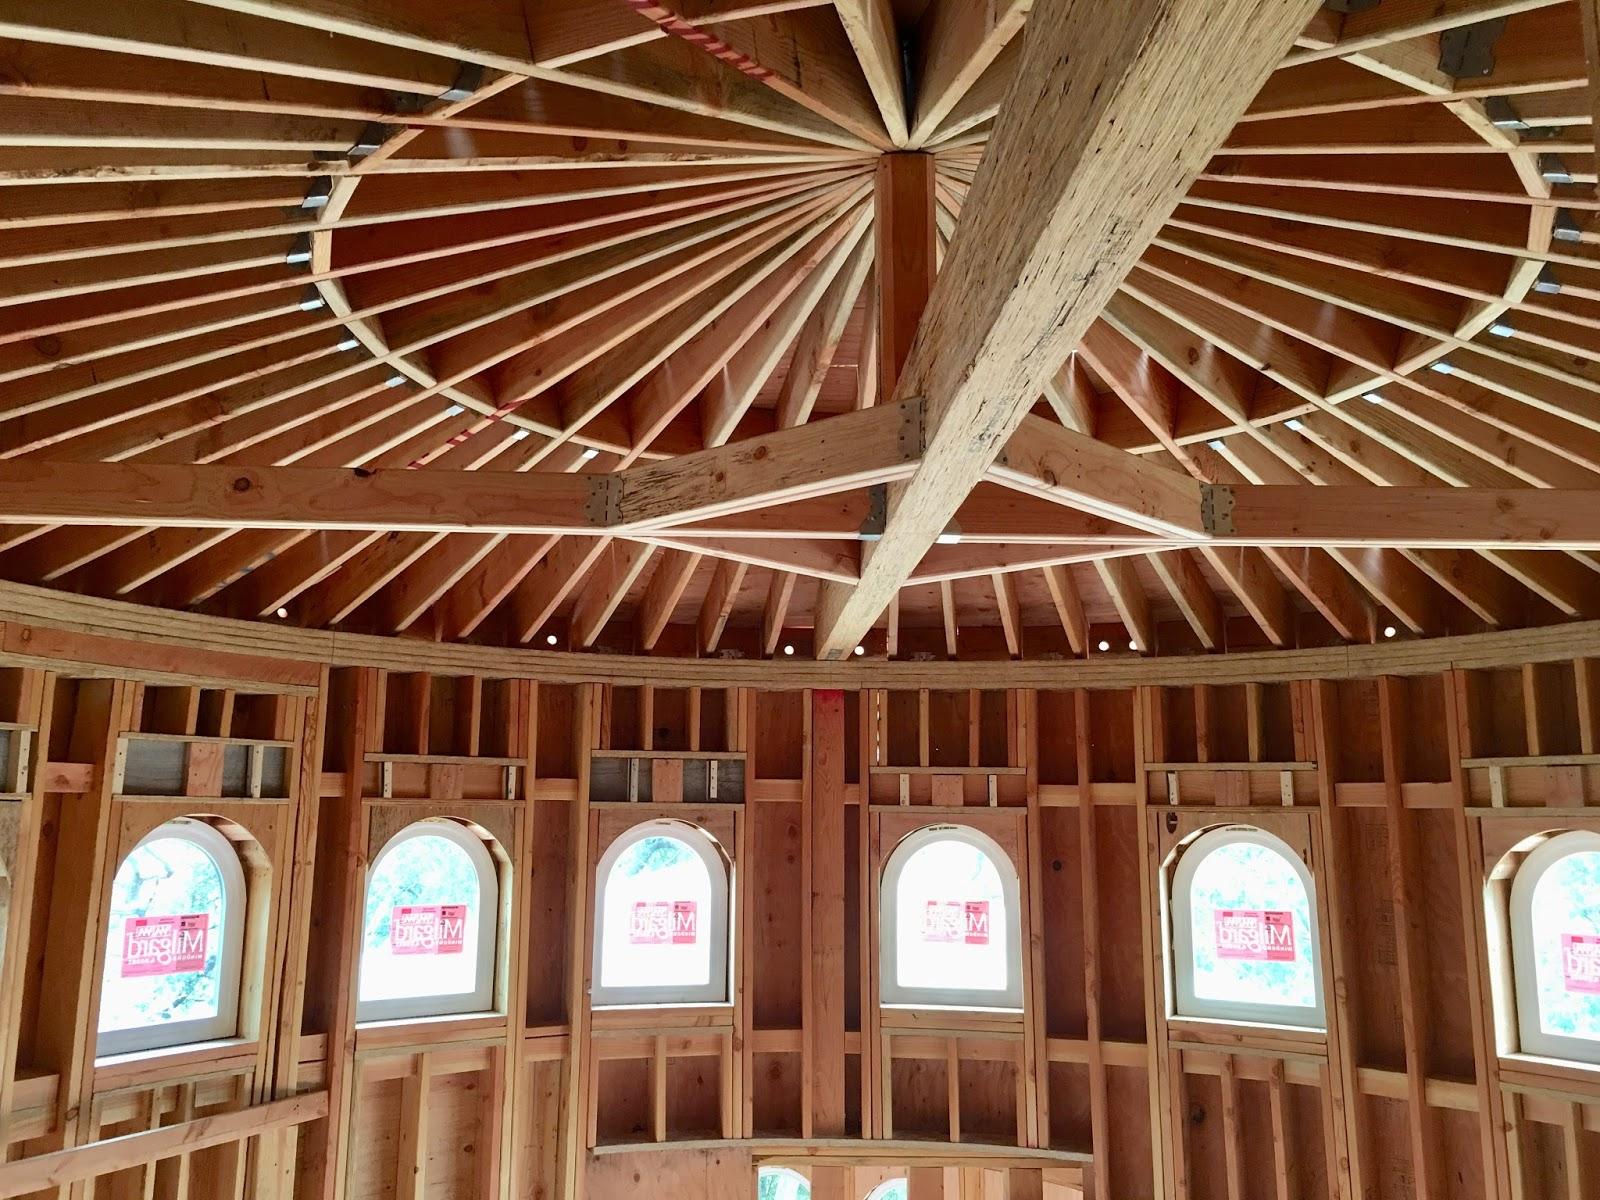 Roof Framing Geometry Freestanding Circular Stair